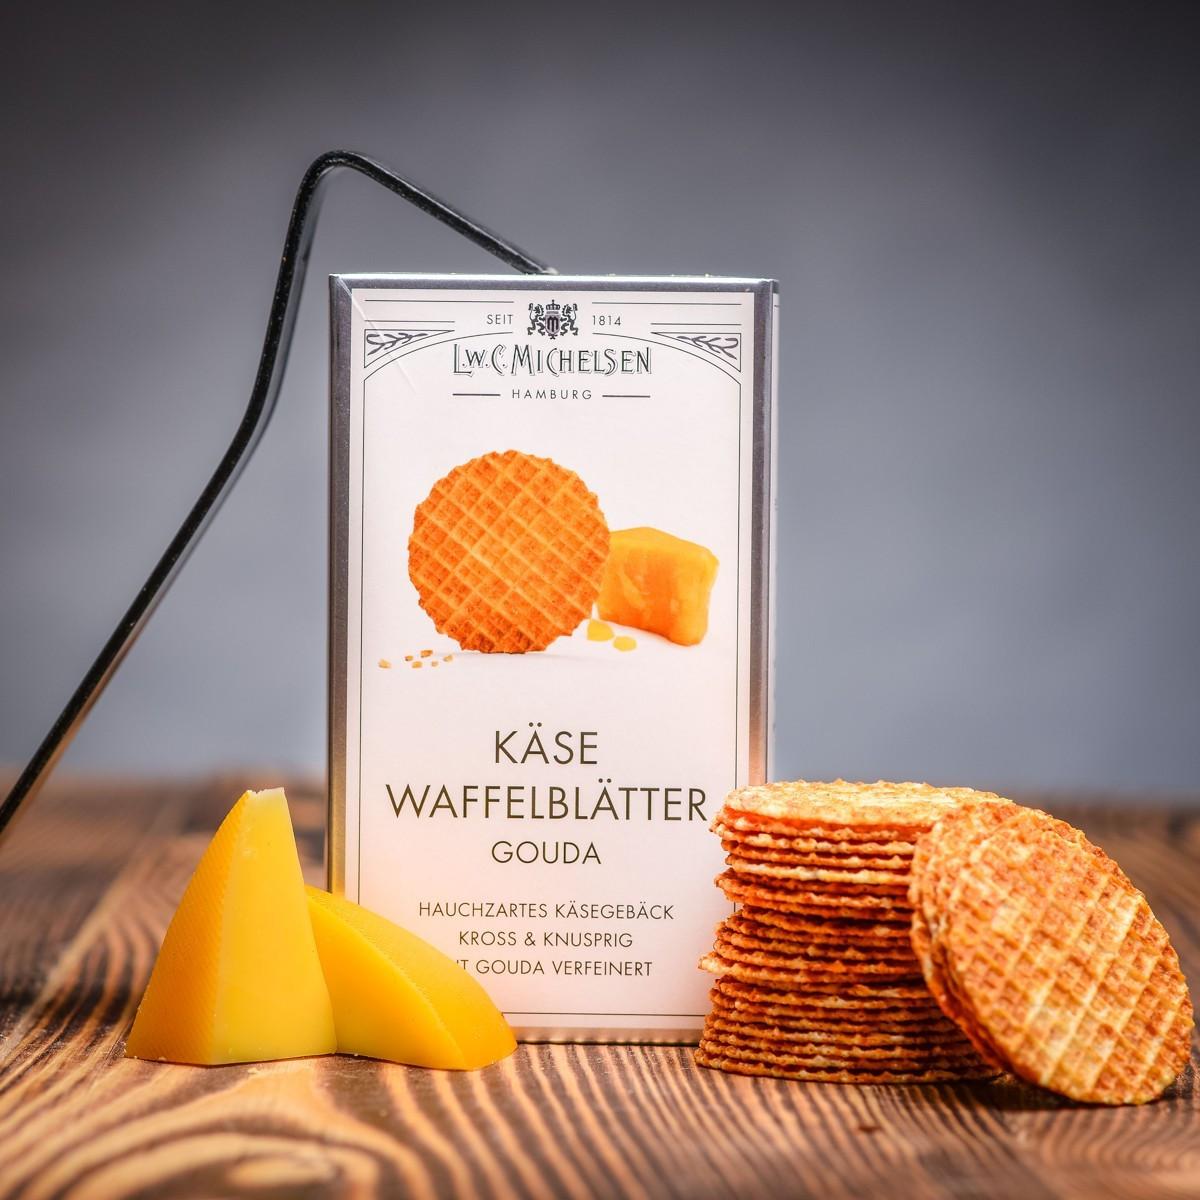 Kase Waffelblatter Gouda 100 g - syrove vafle.JPG